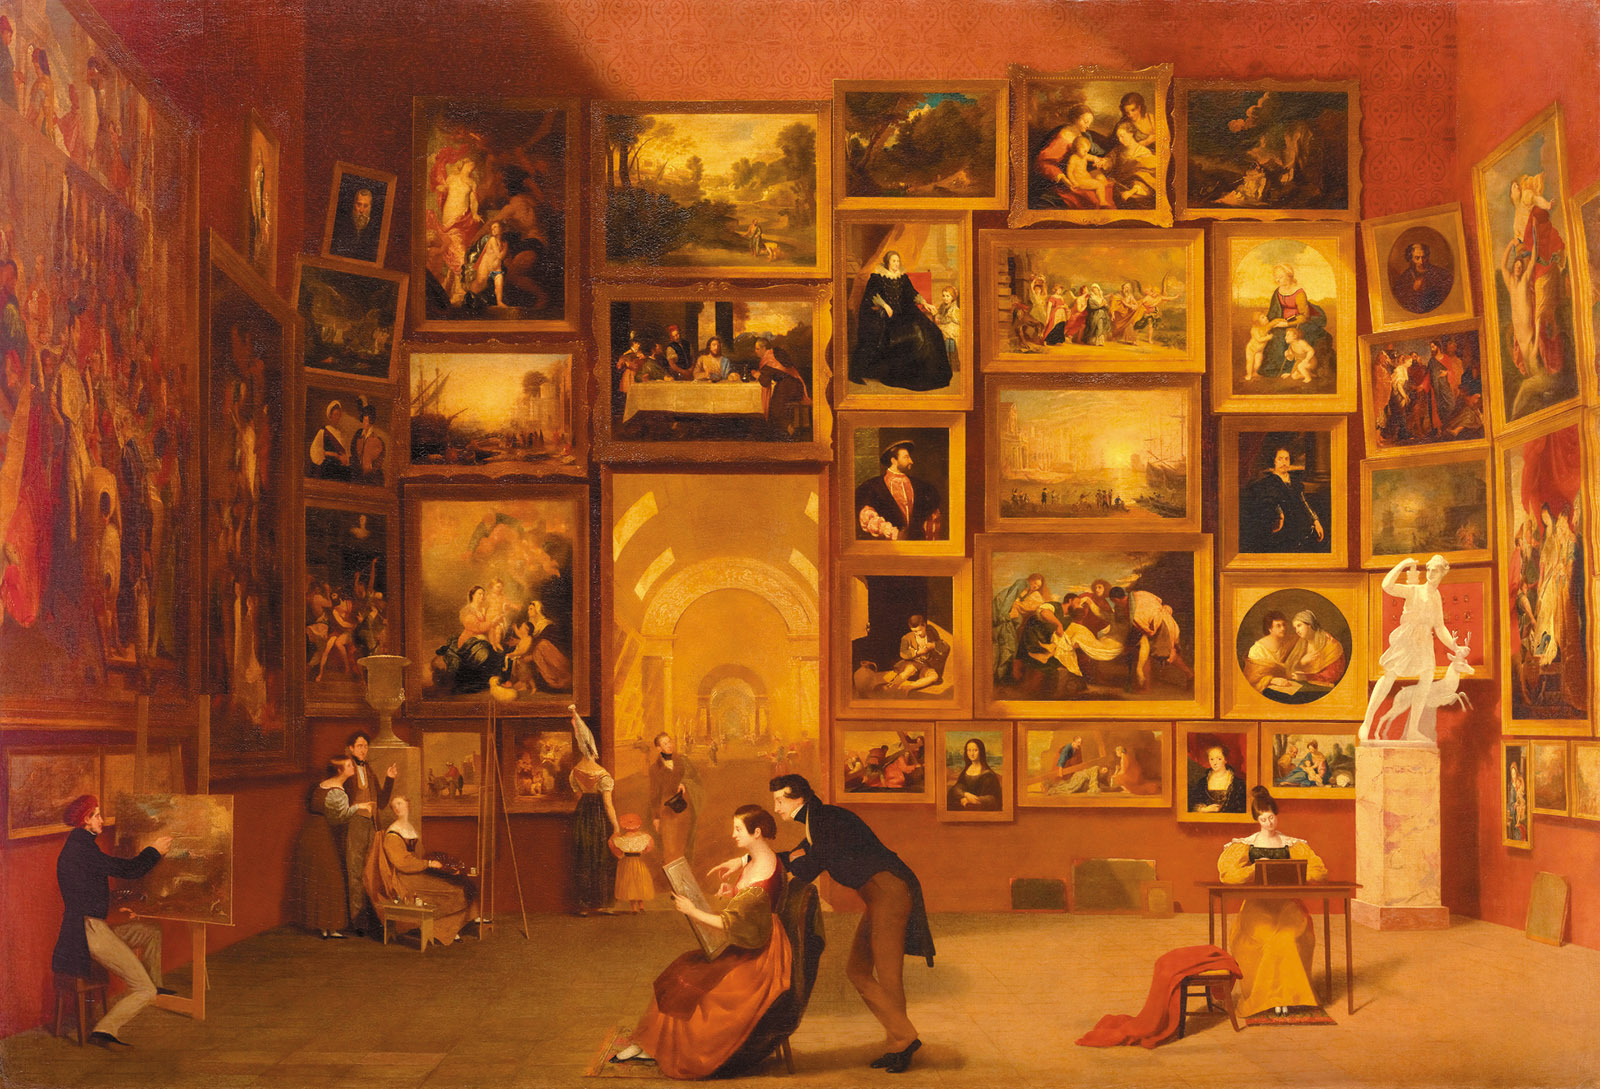 Samuel F.B. Morse: Gallery of the Louvre, 1831–1833